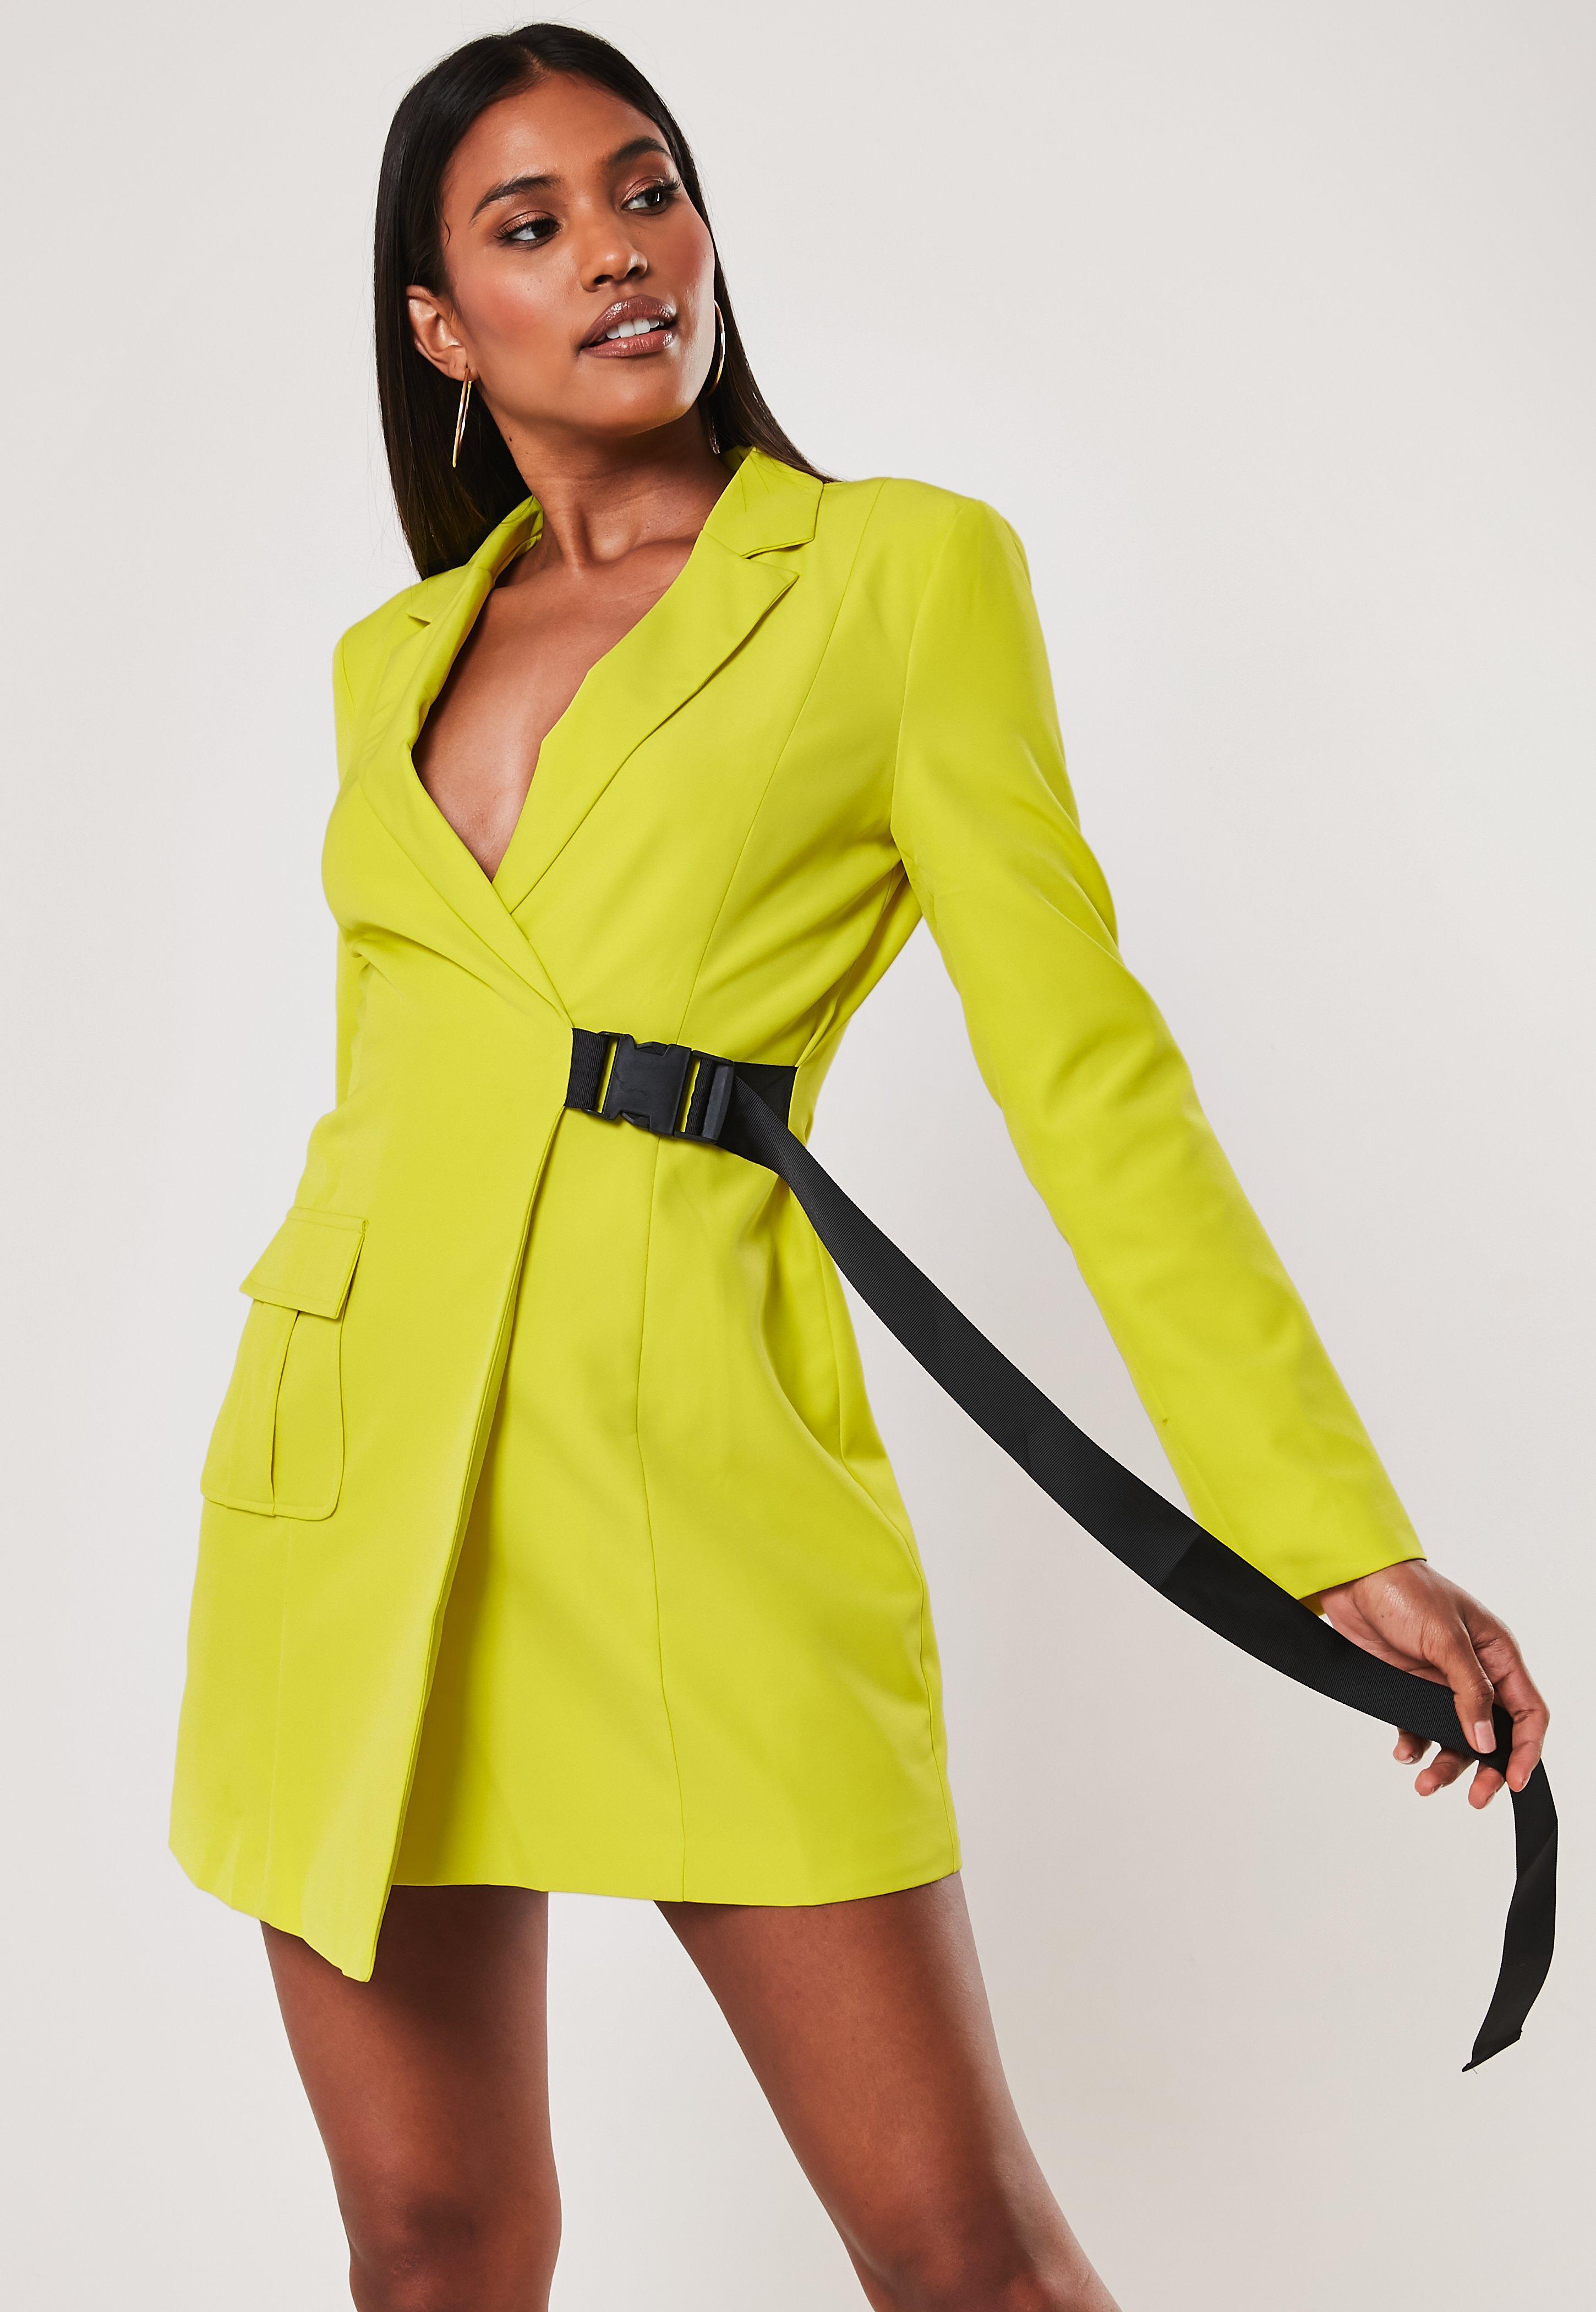 fffad3f4b49 Blazer Dresses | Shop Tuxedo Dresses - Missguided